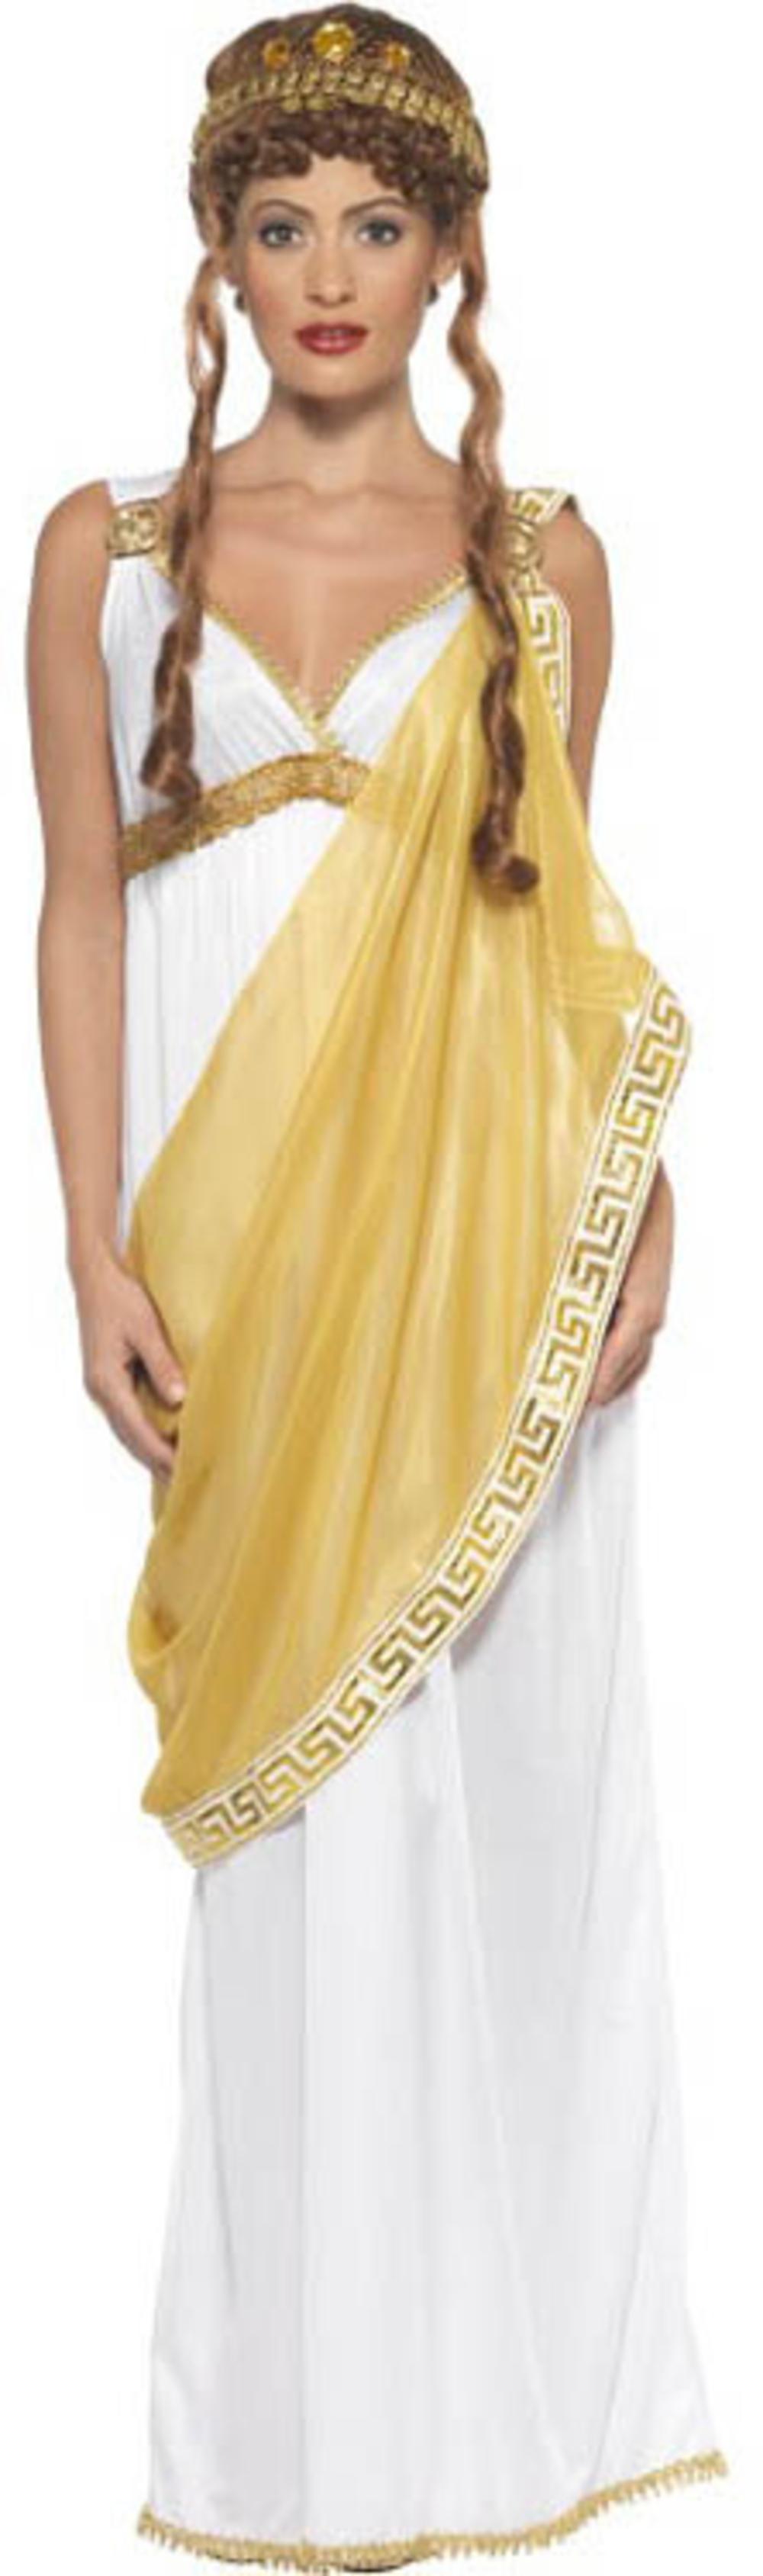 Helen of Troy Ladies Ladies Fancy Dress Ancient Greek Roman Adult Costume Outfit